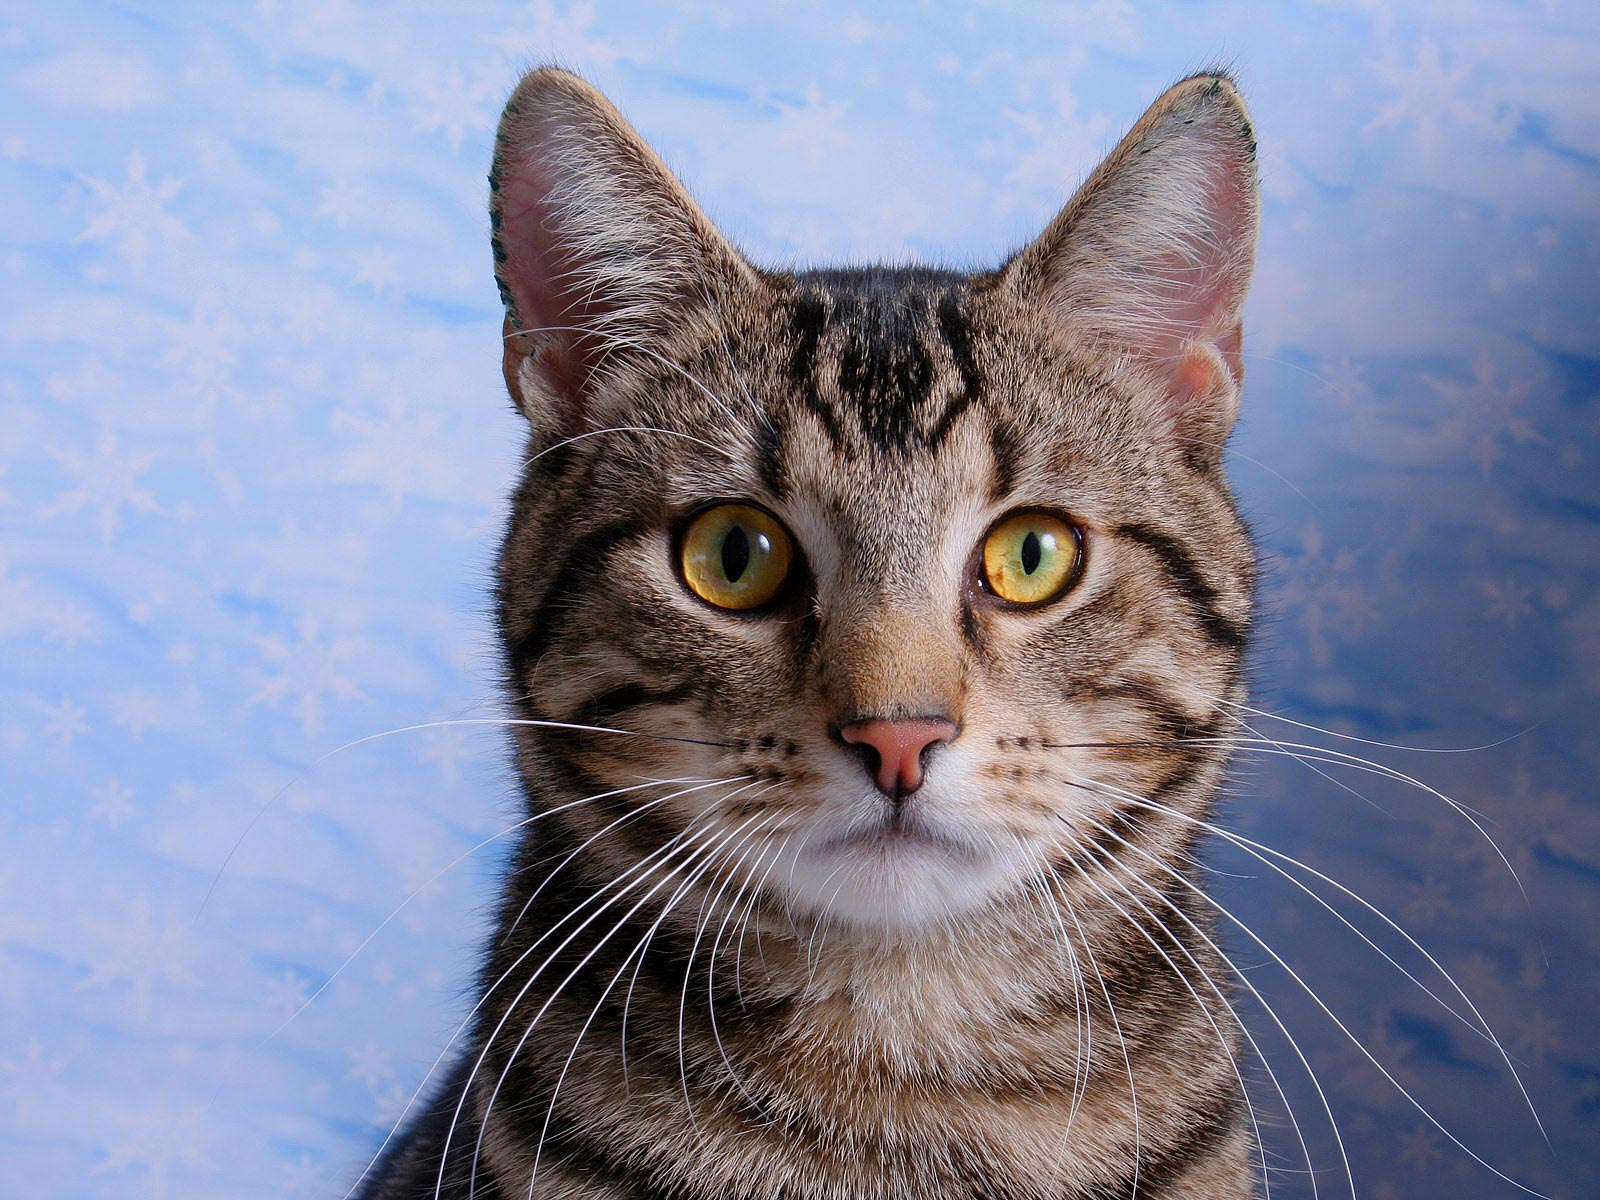 Desktop Wallpaper · Gallery · Animals American Shorthair English domestic cat